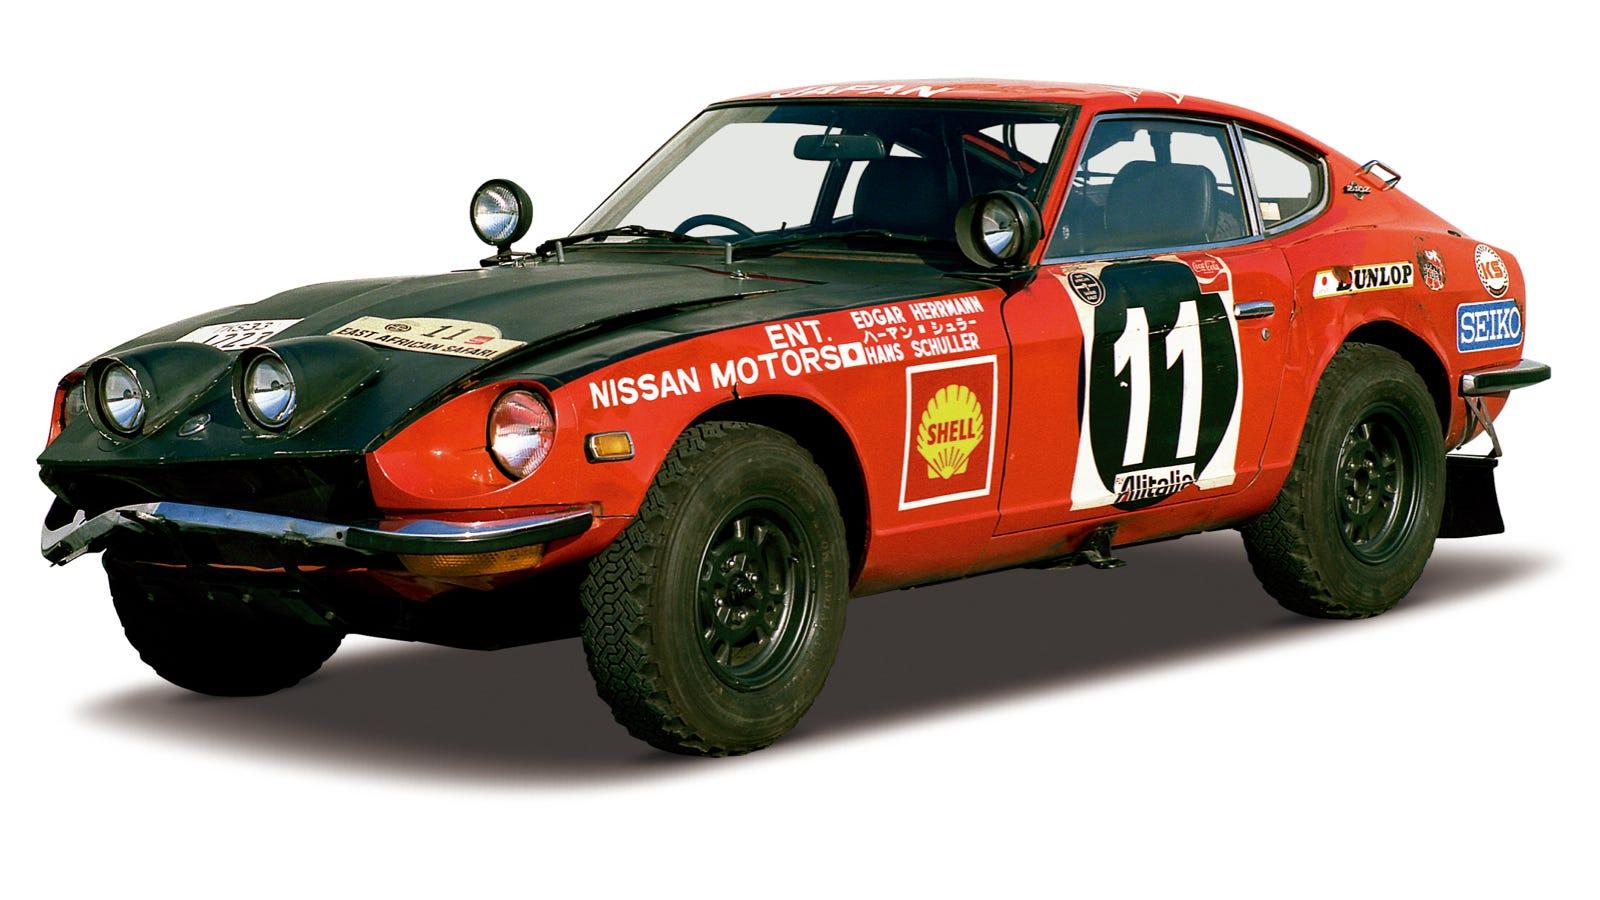 Nissan Volunteers Will Restore This Badass 240z Rally Car